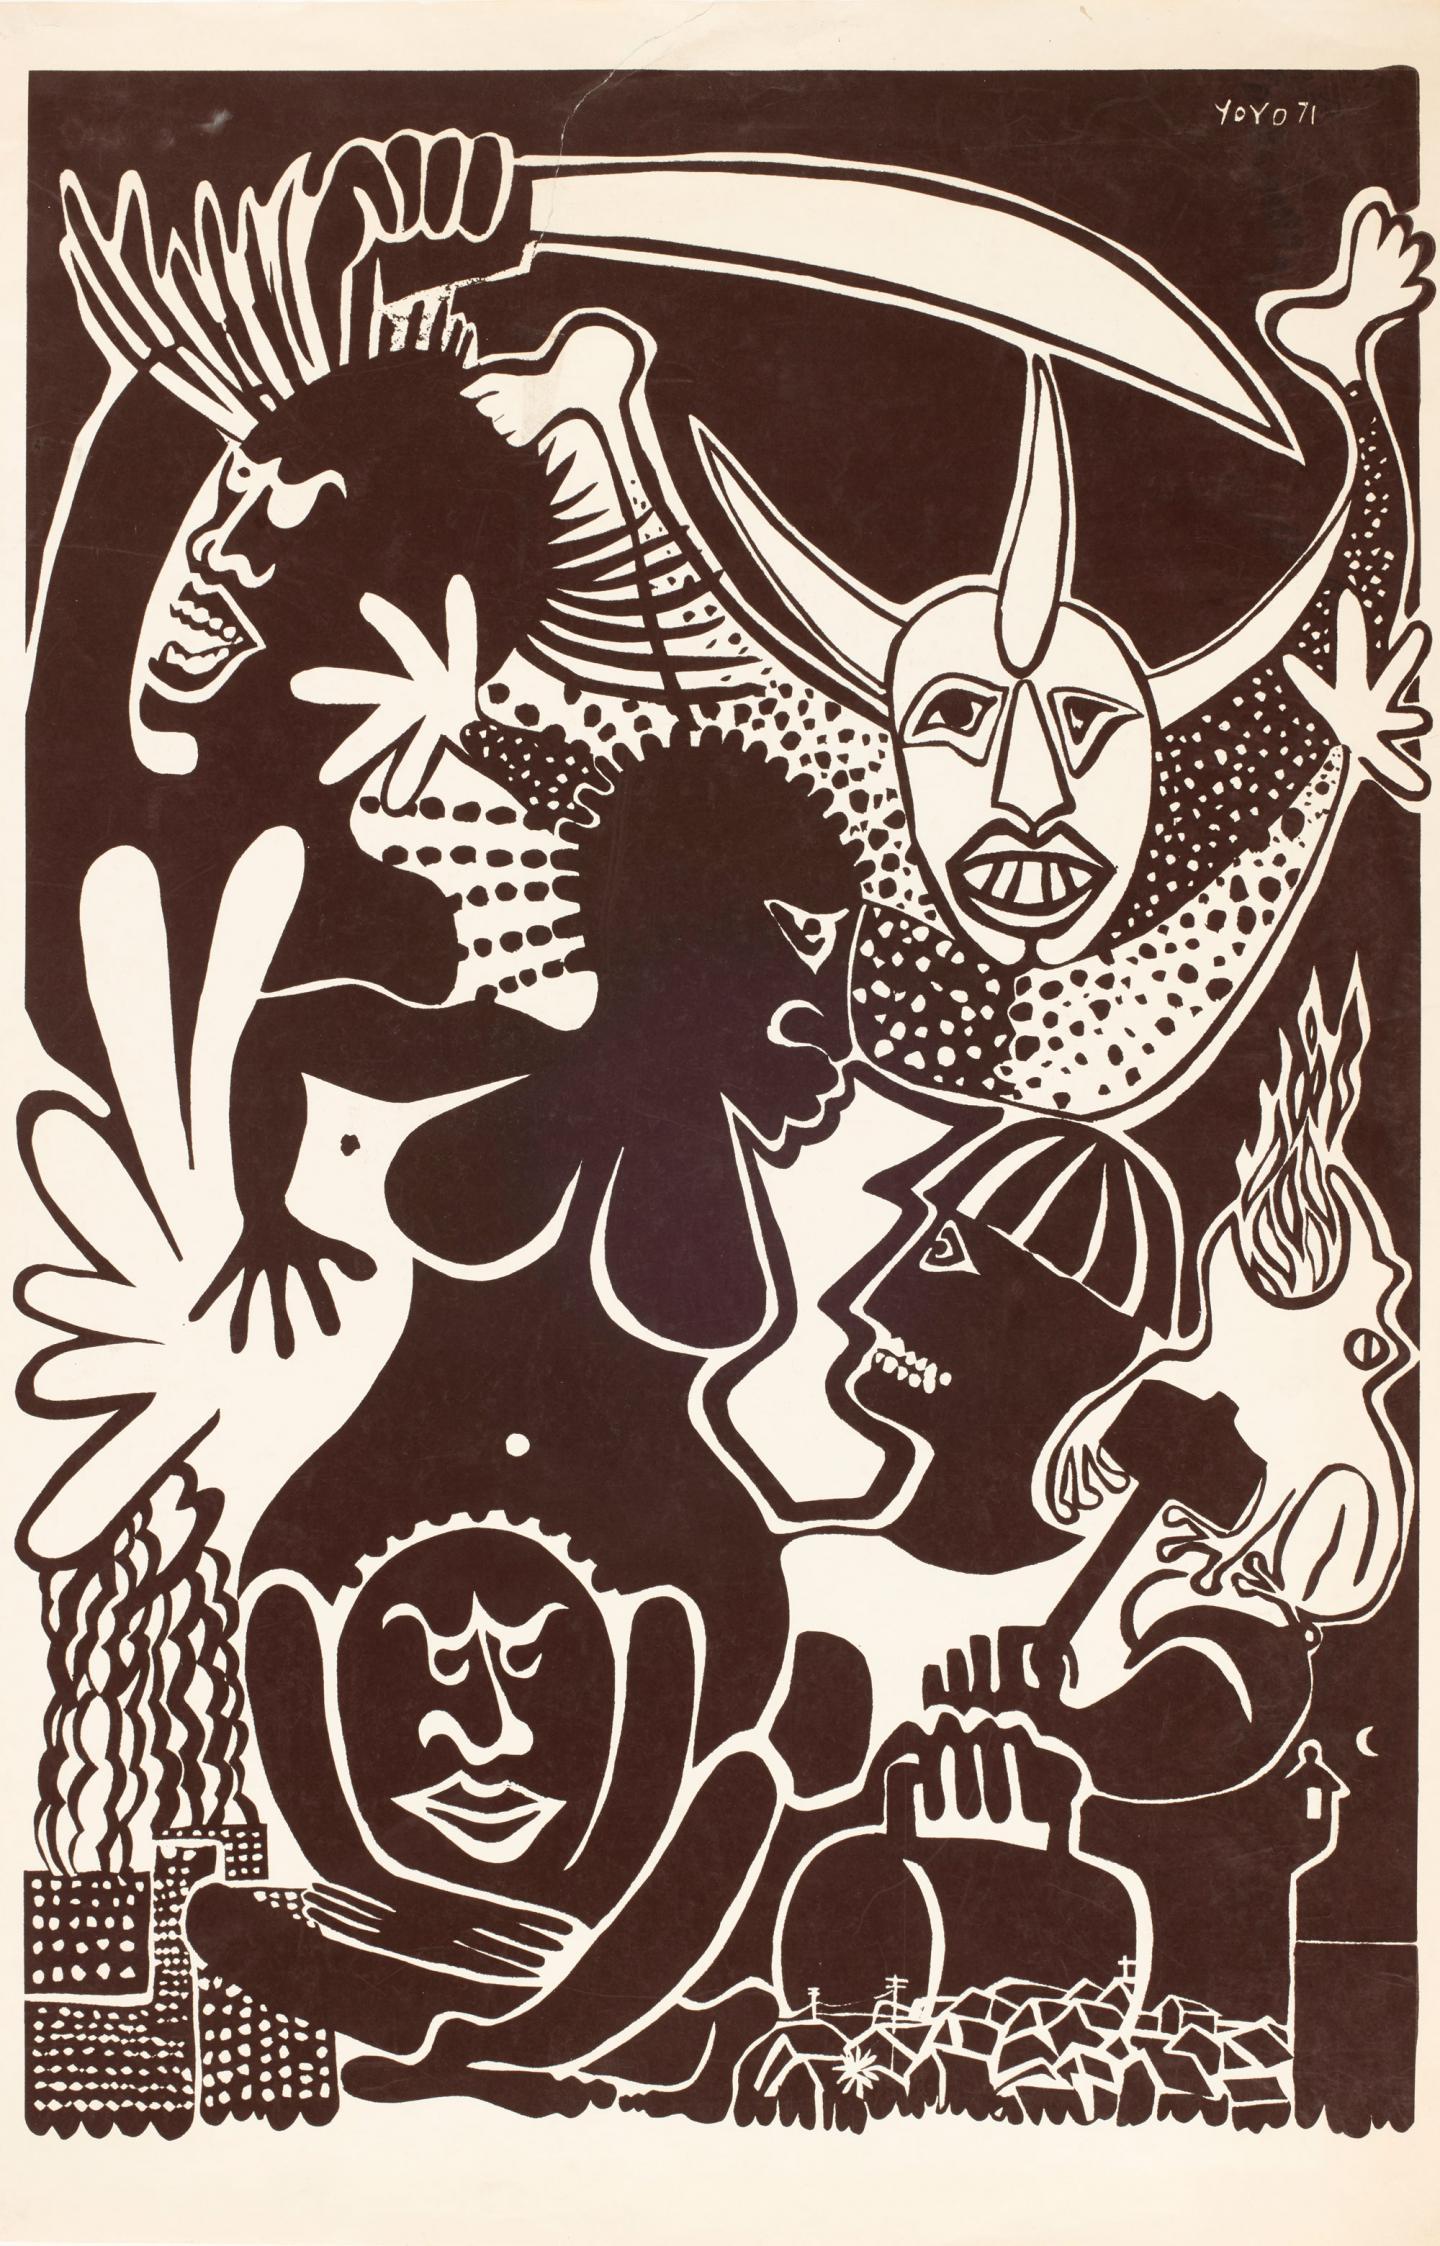 Yoyo Rodriguez, Untitled, 1971, serigraph